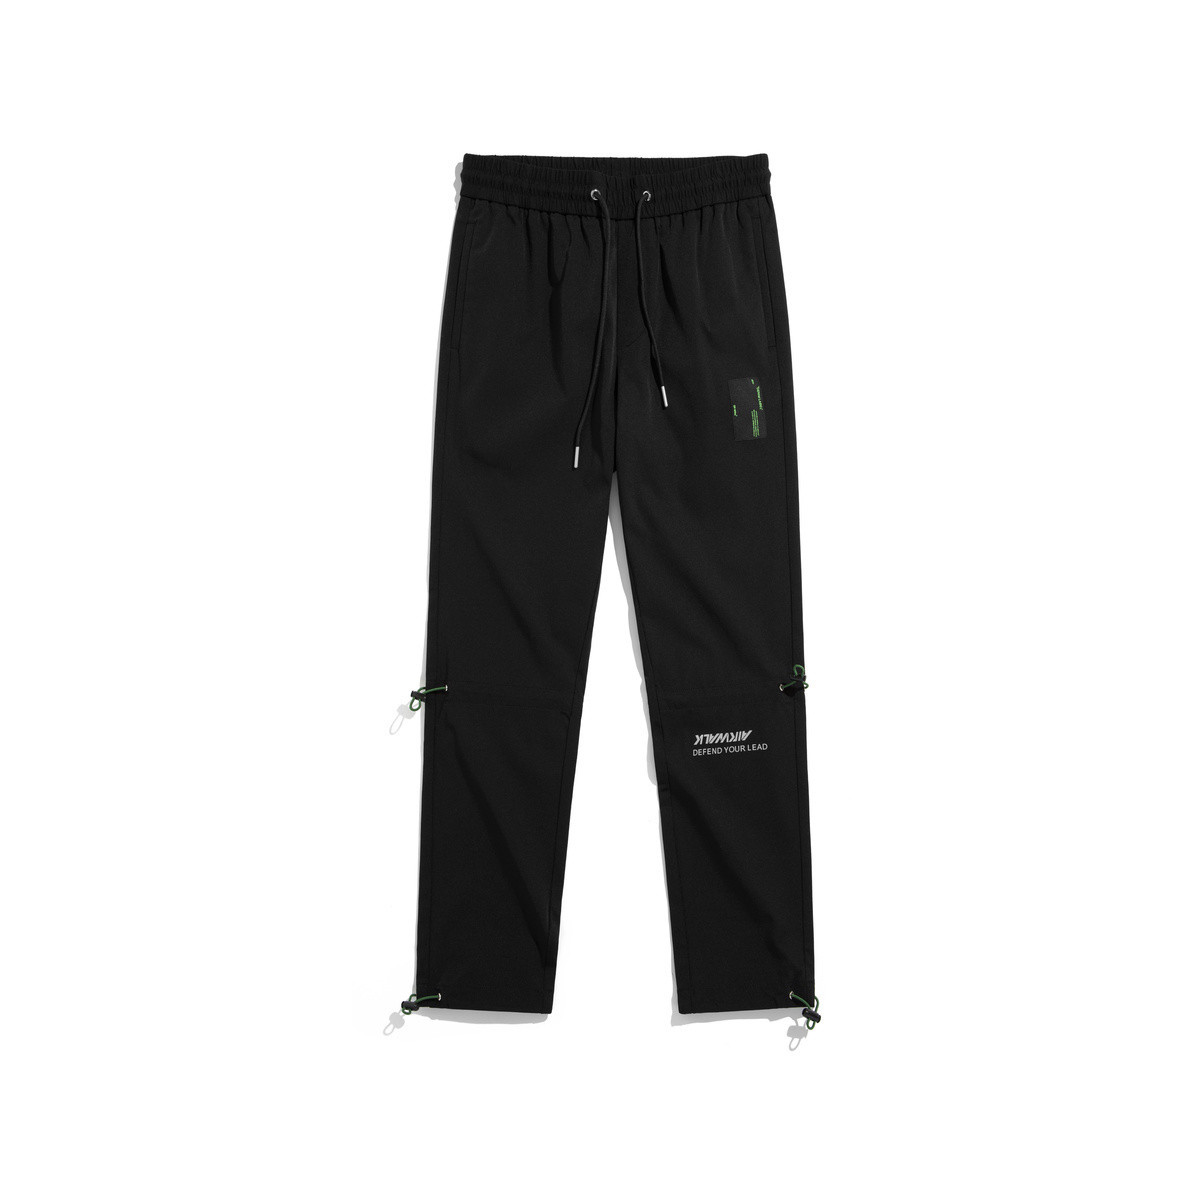 gxg.jeans2019秋装新品简约运动裤男士休闲裤JY102833E000